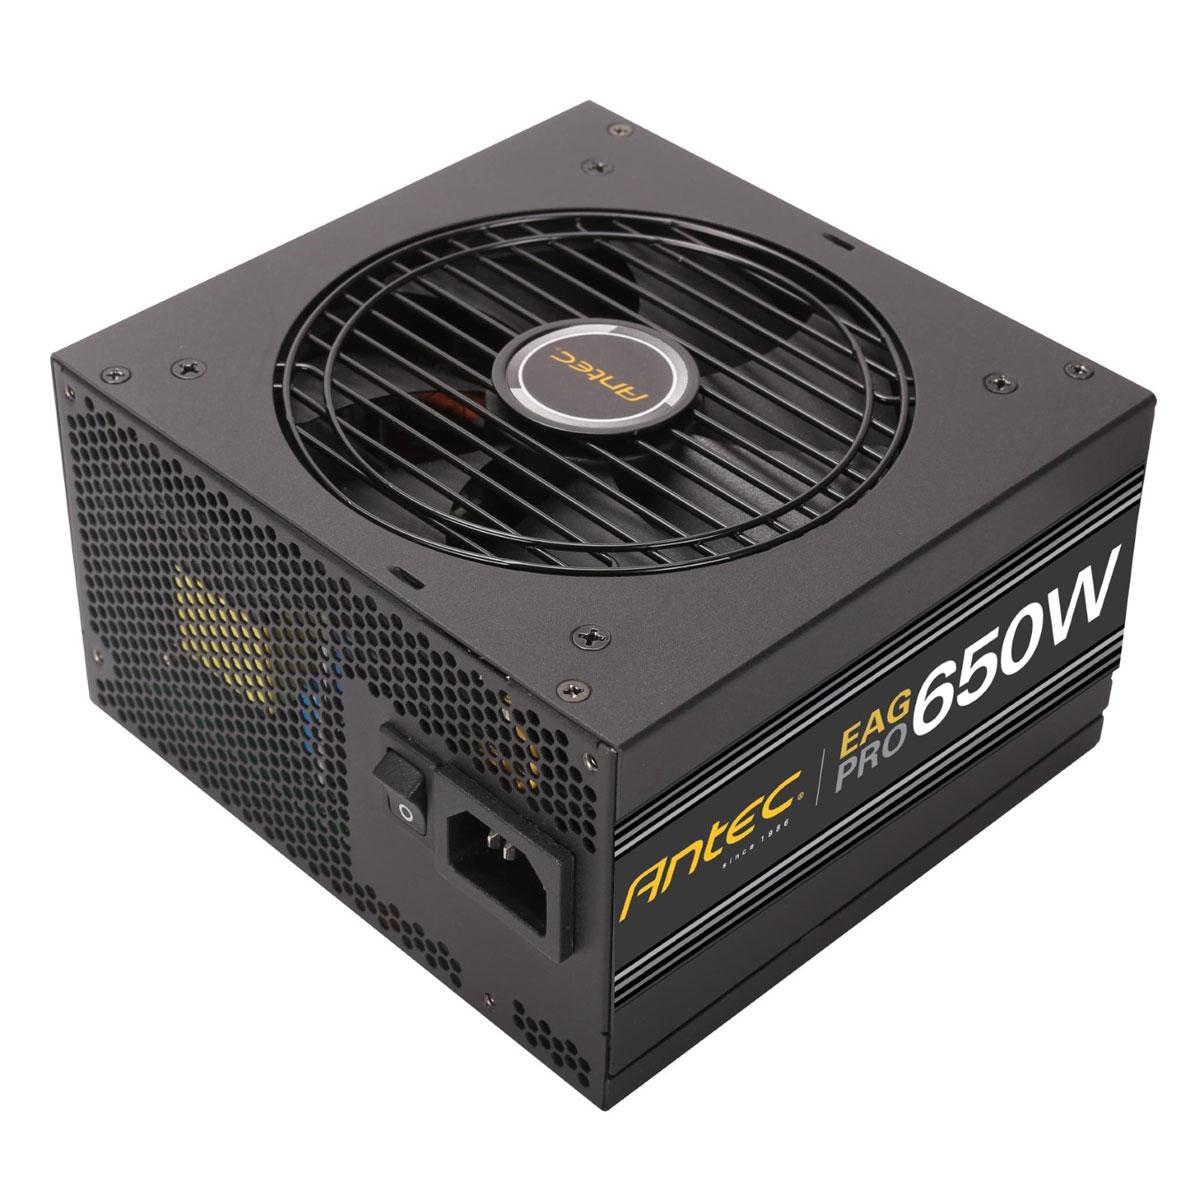 Alimentation PC Antec EA650G PRO Alimentation modulaire 650 Watts ATX12V 2.3 80 PLUS Gold